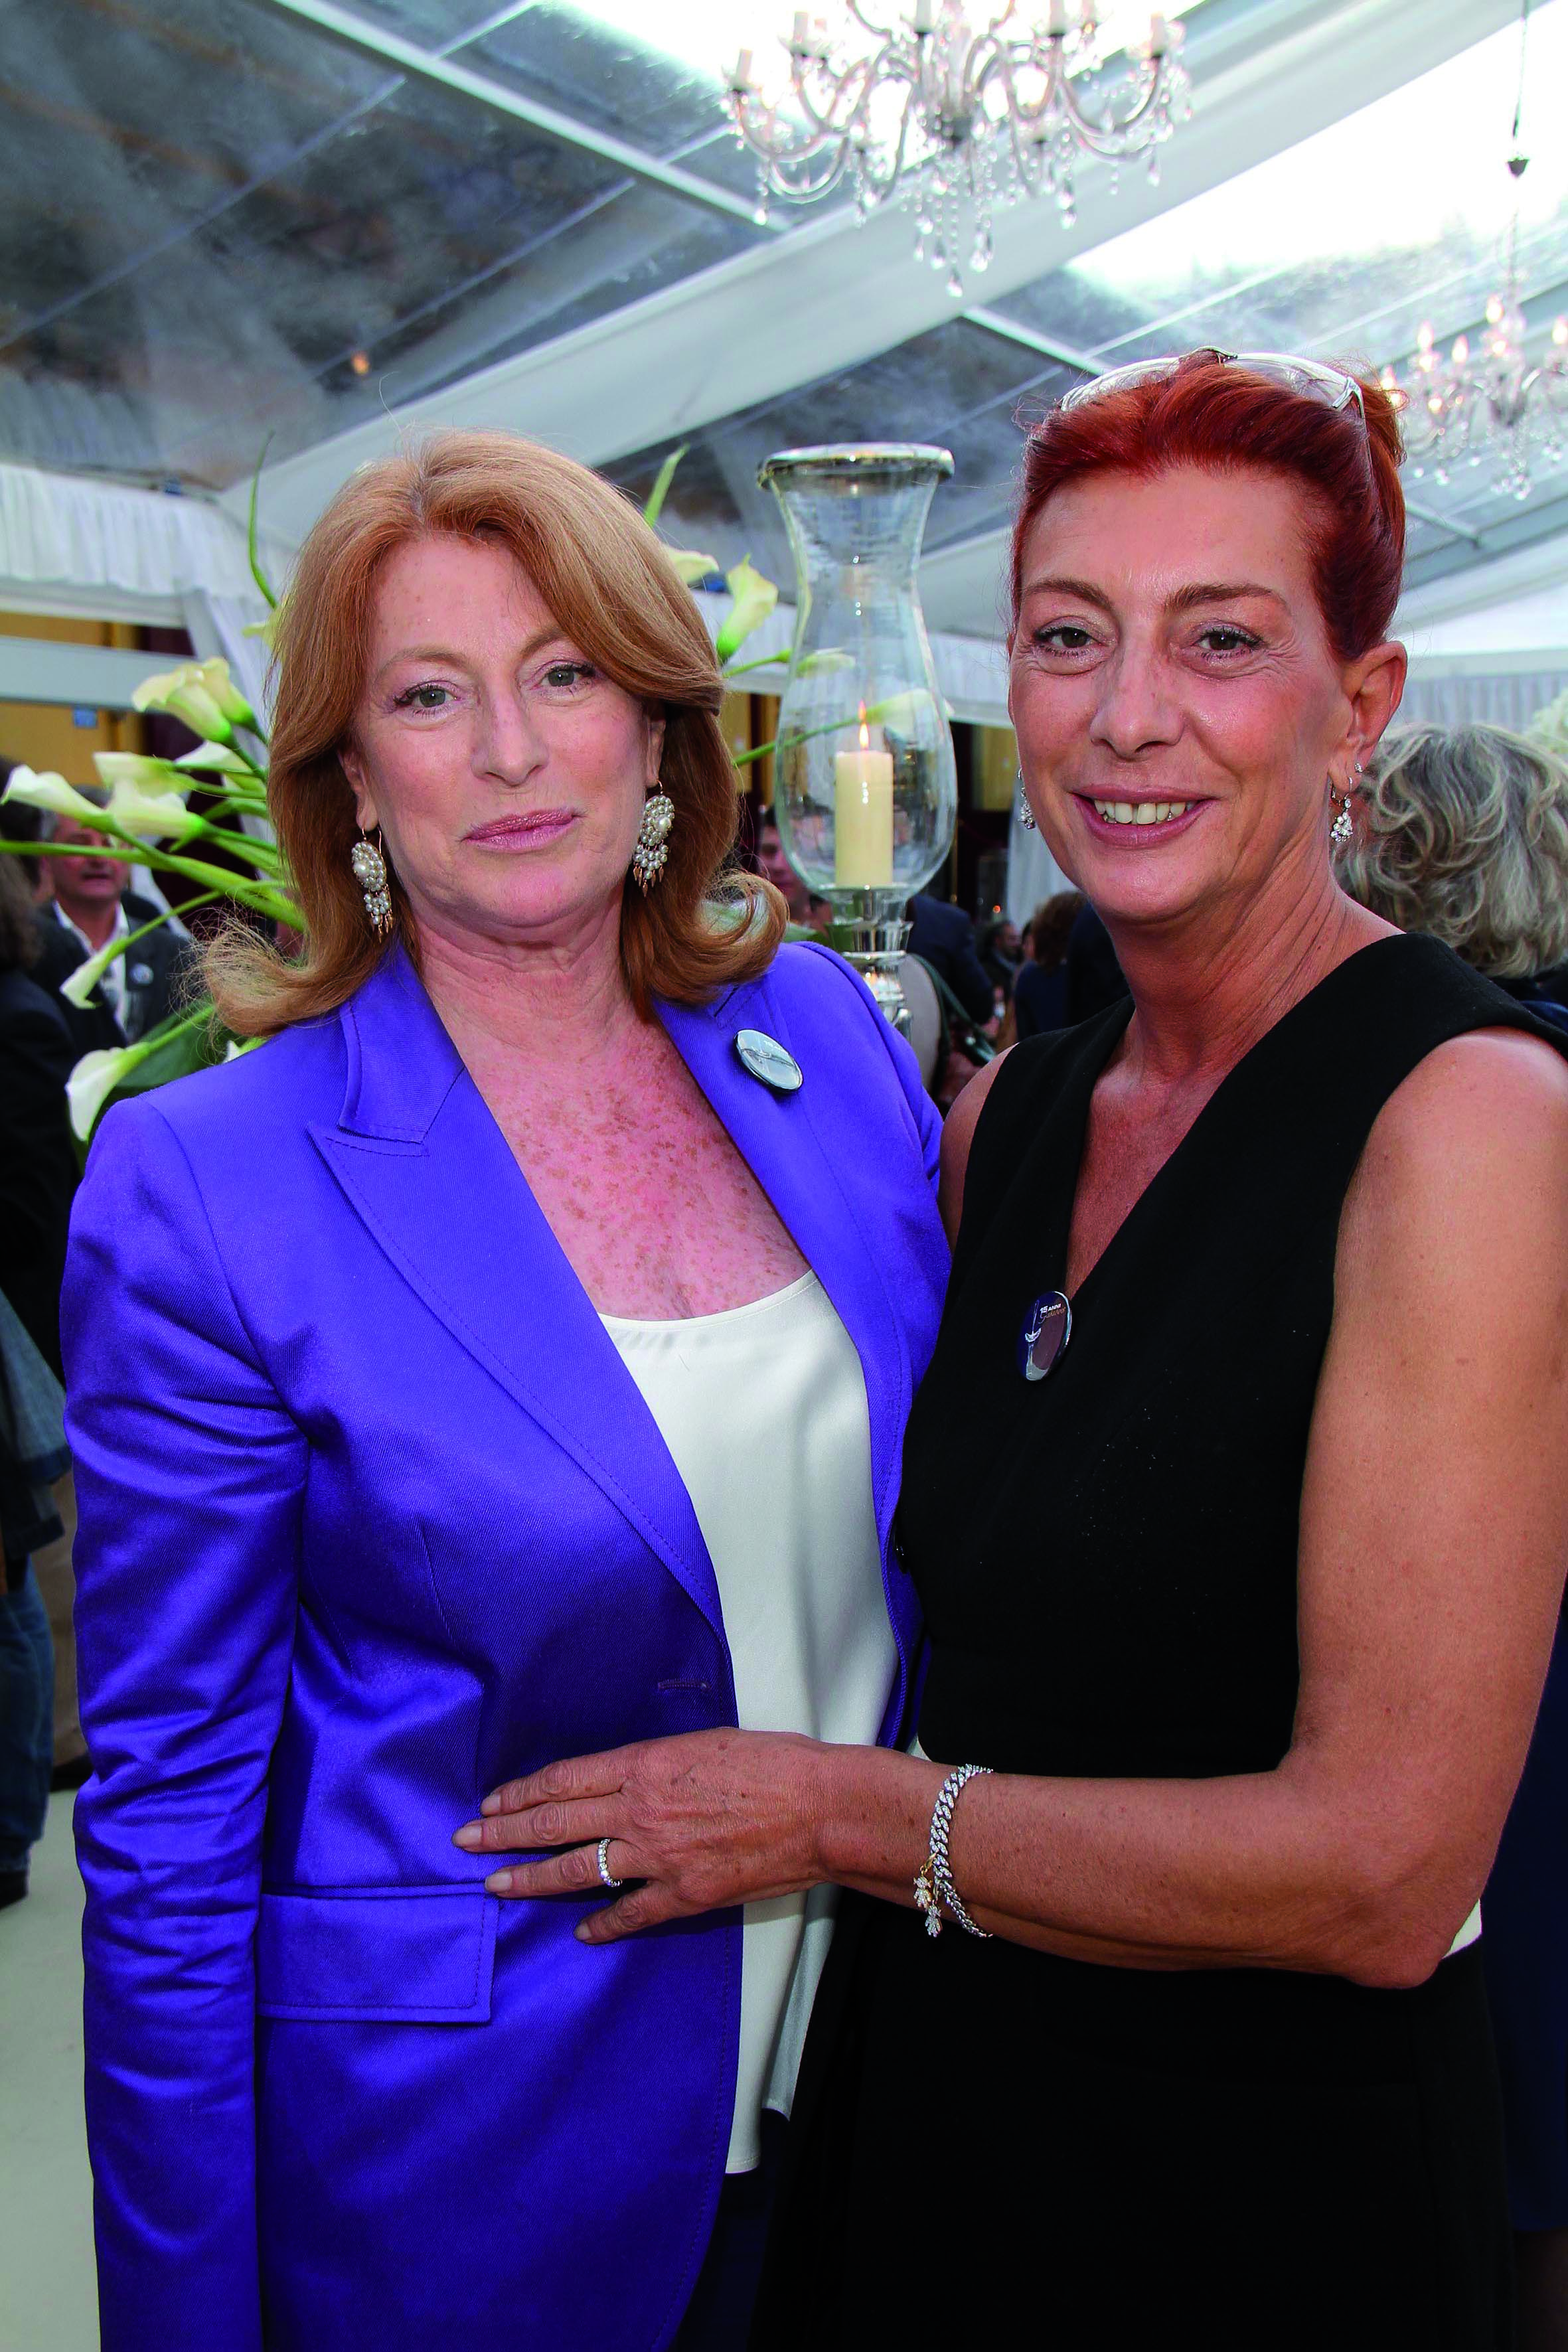 PRESSPHOTO. Firenze, festa Galateo e Uoll. Nella foto Simona Pelagotti e Elisabetta Rogai